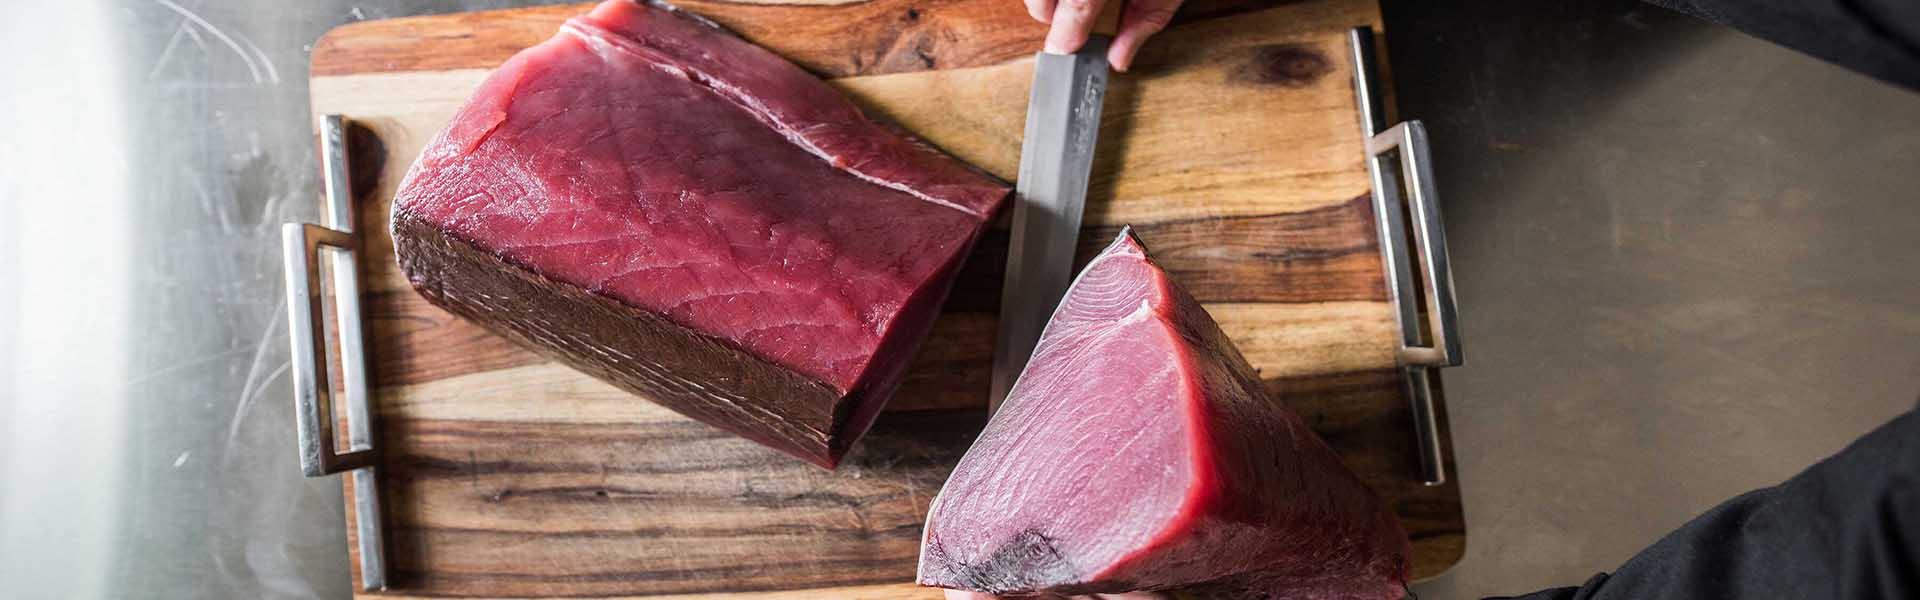 tuna-being-sliced